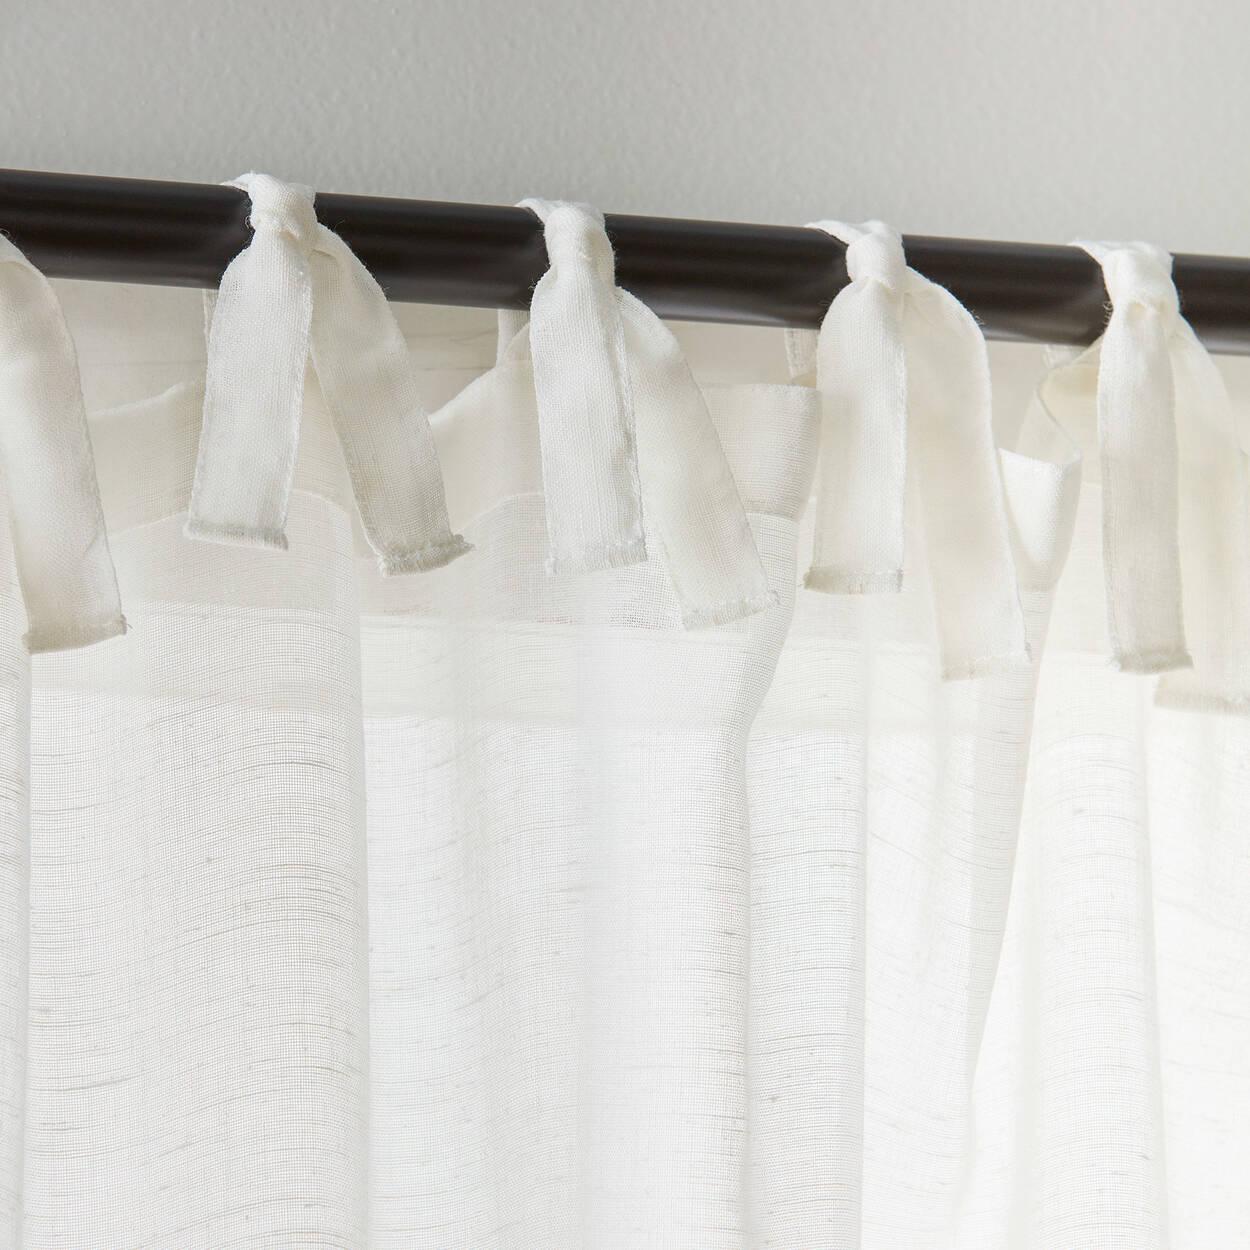 Jessica Tie Top Sheer Curtain Bouclaircom